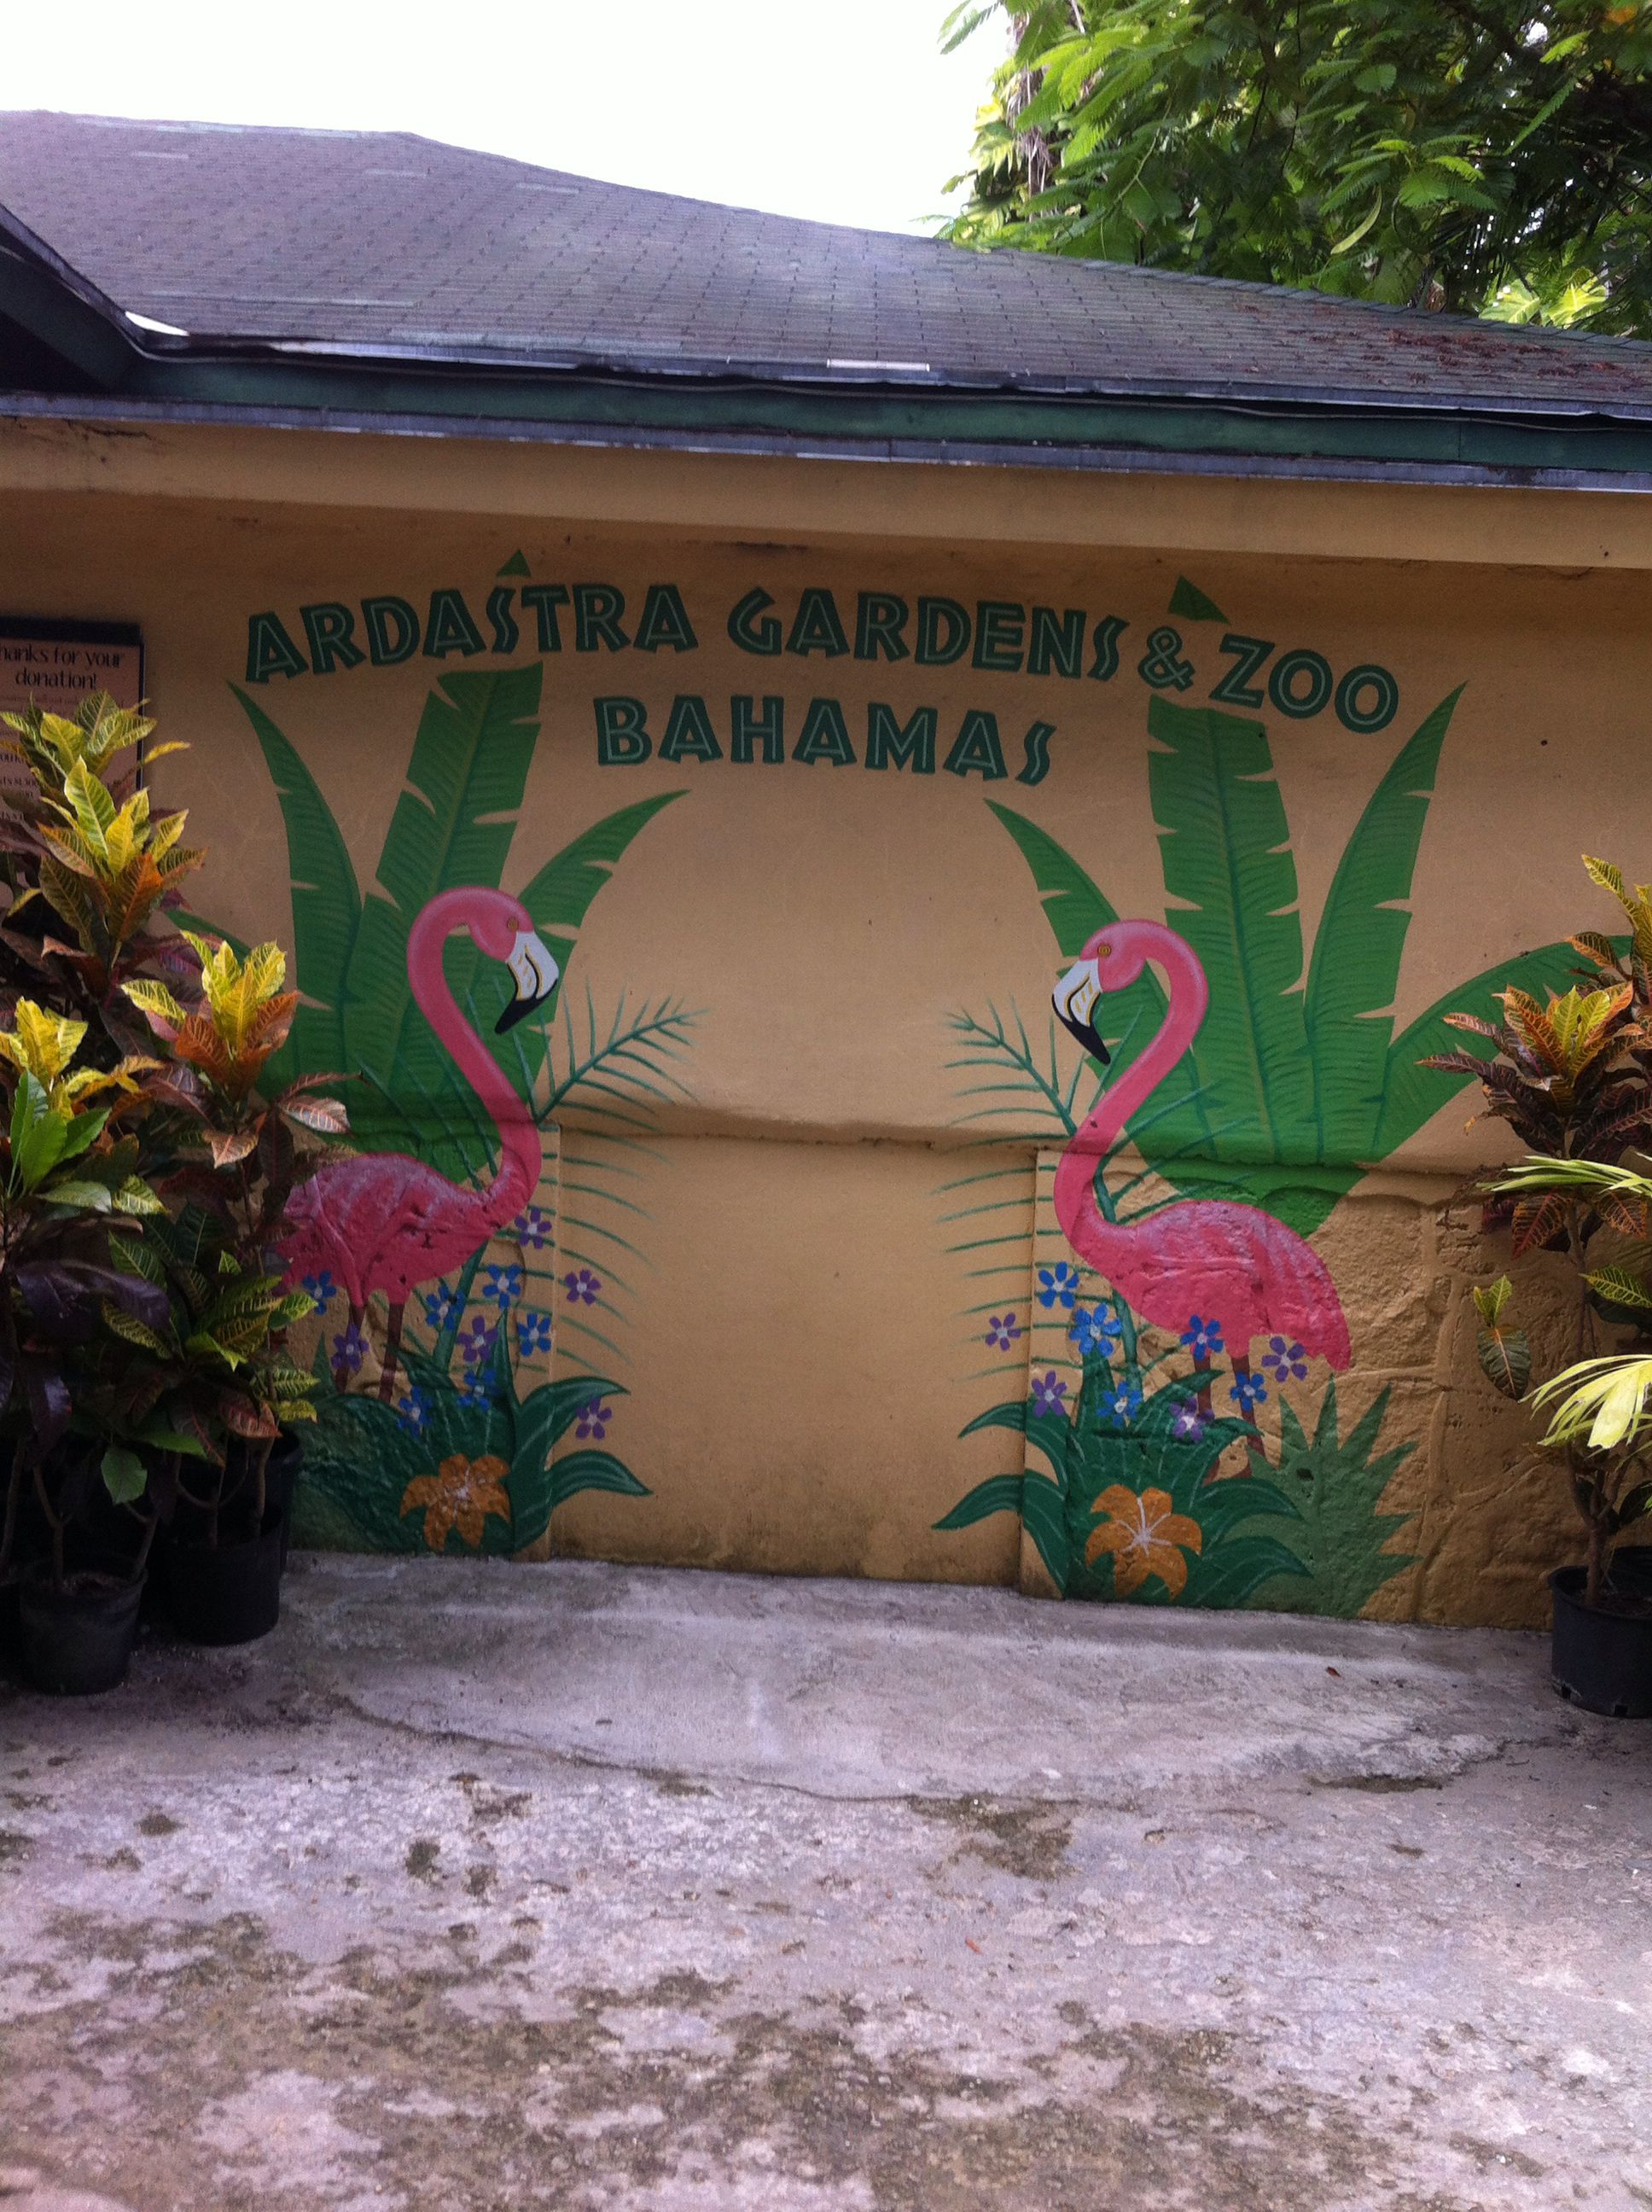 9a3adb6f14c1b9bbf8c2764ef47eef33 - Nassau Bahamas Ardastra Gardens And Zoo